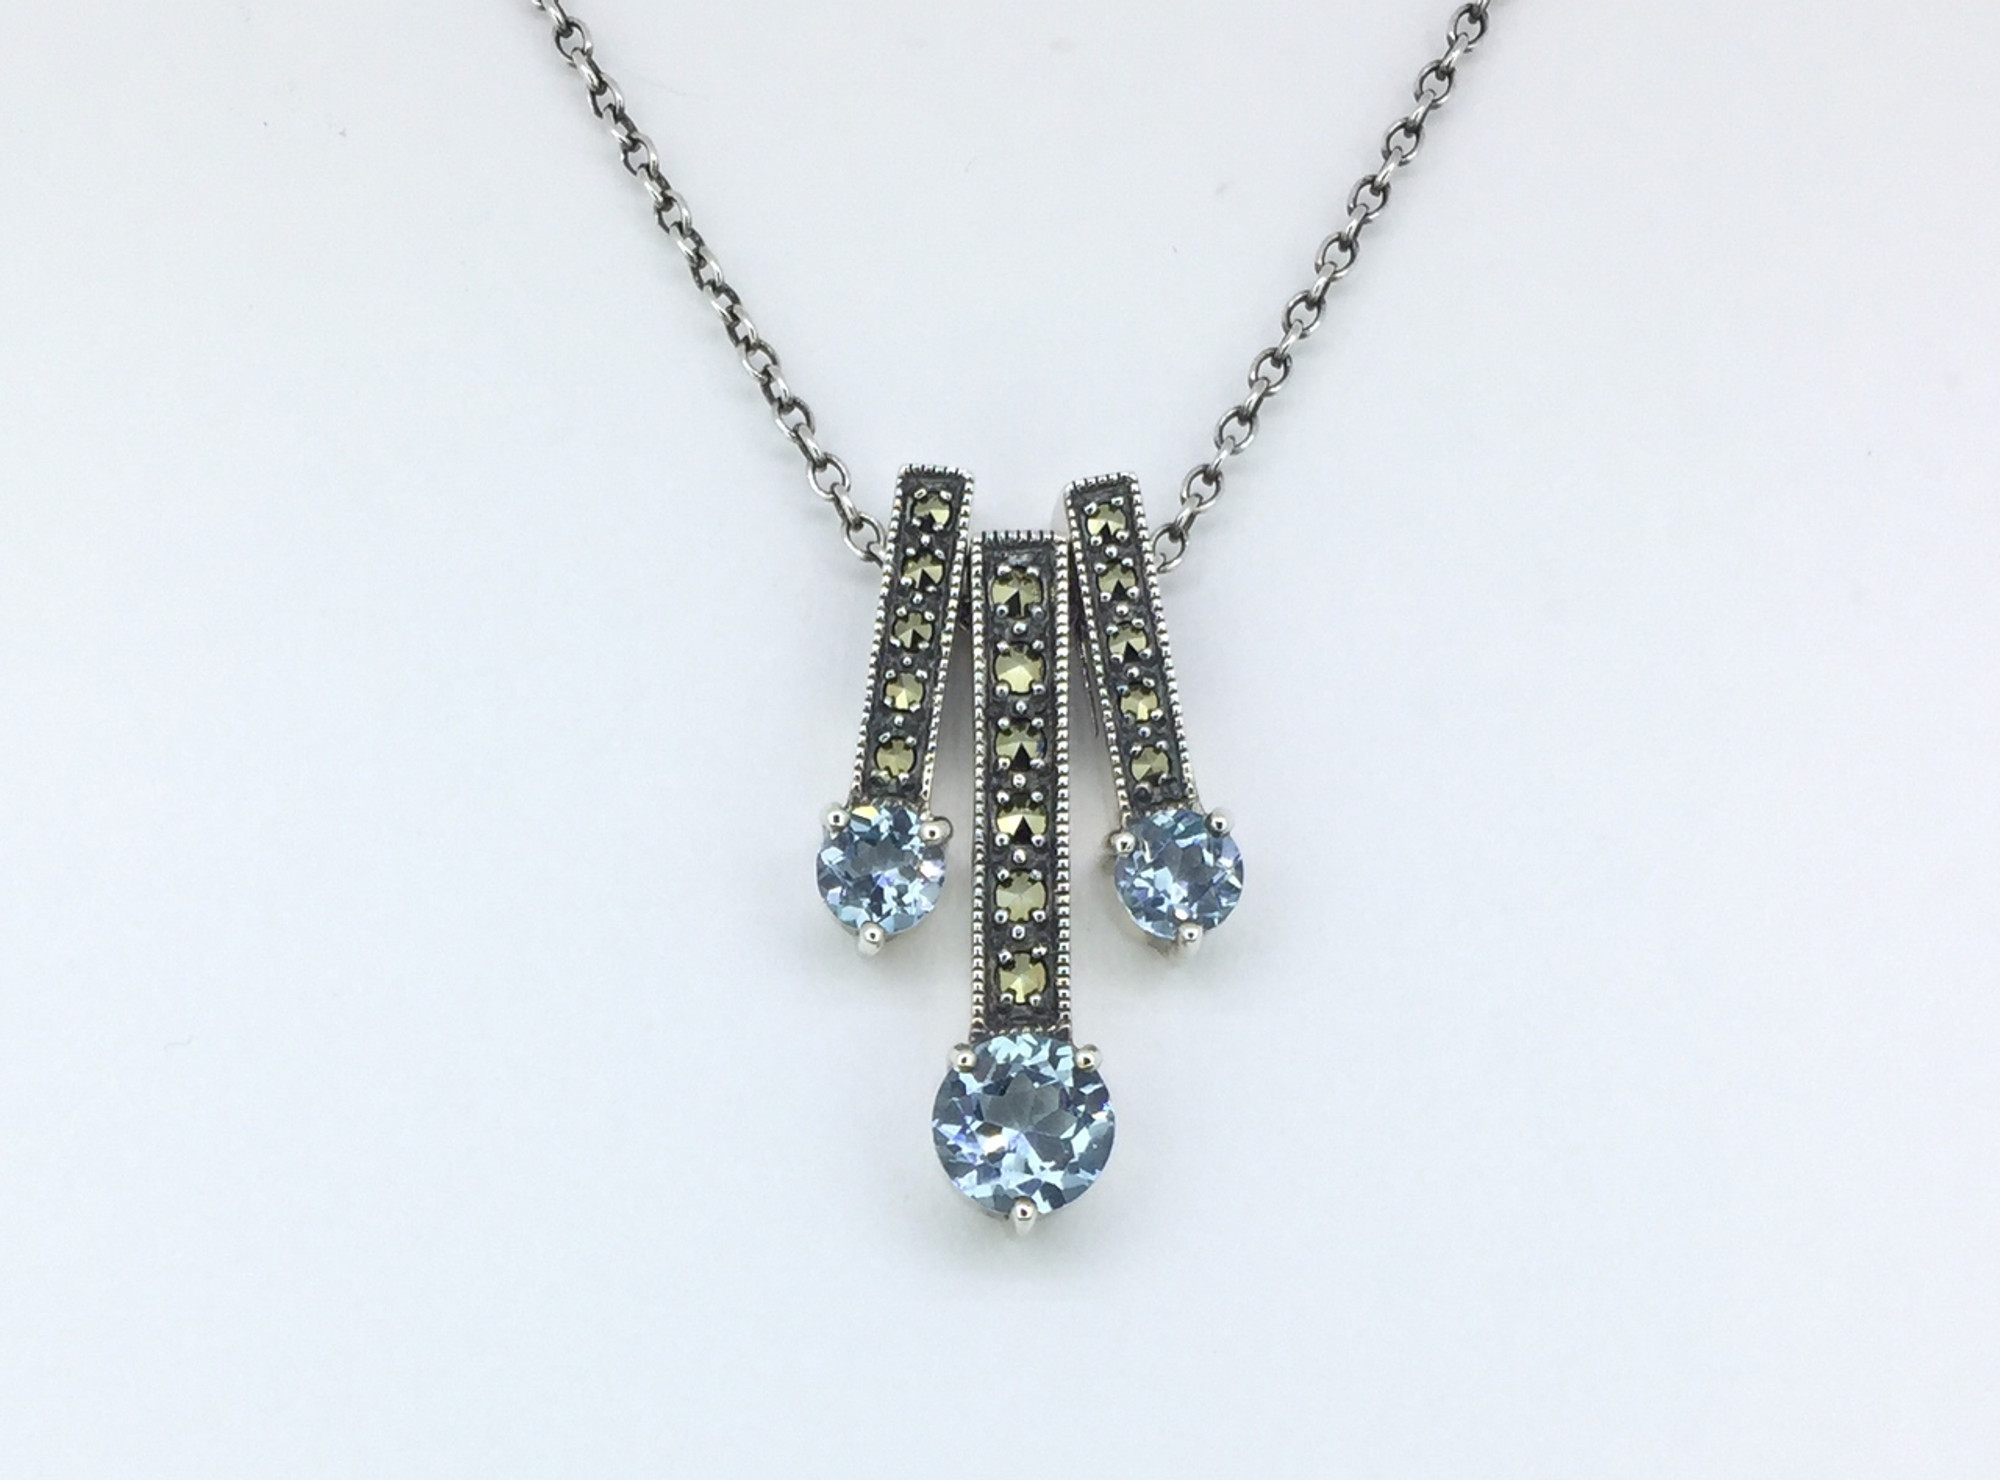 Triple Round Blue Topaz/Marcasite Necklace